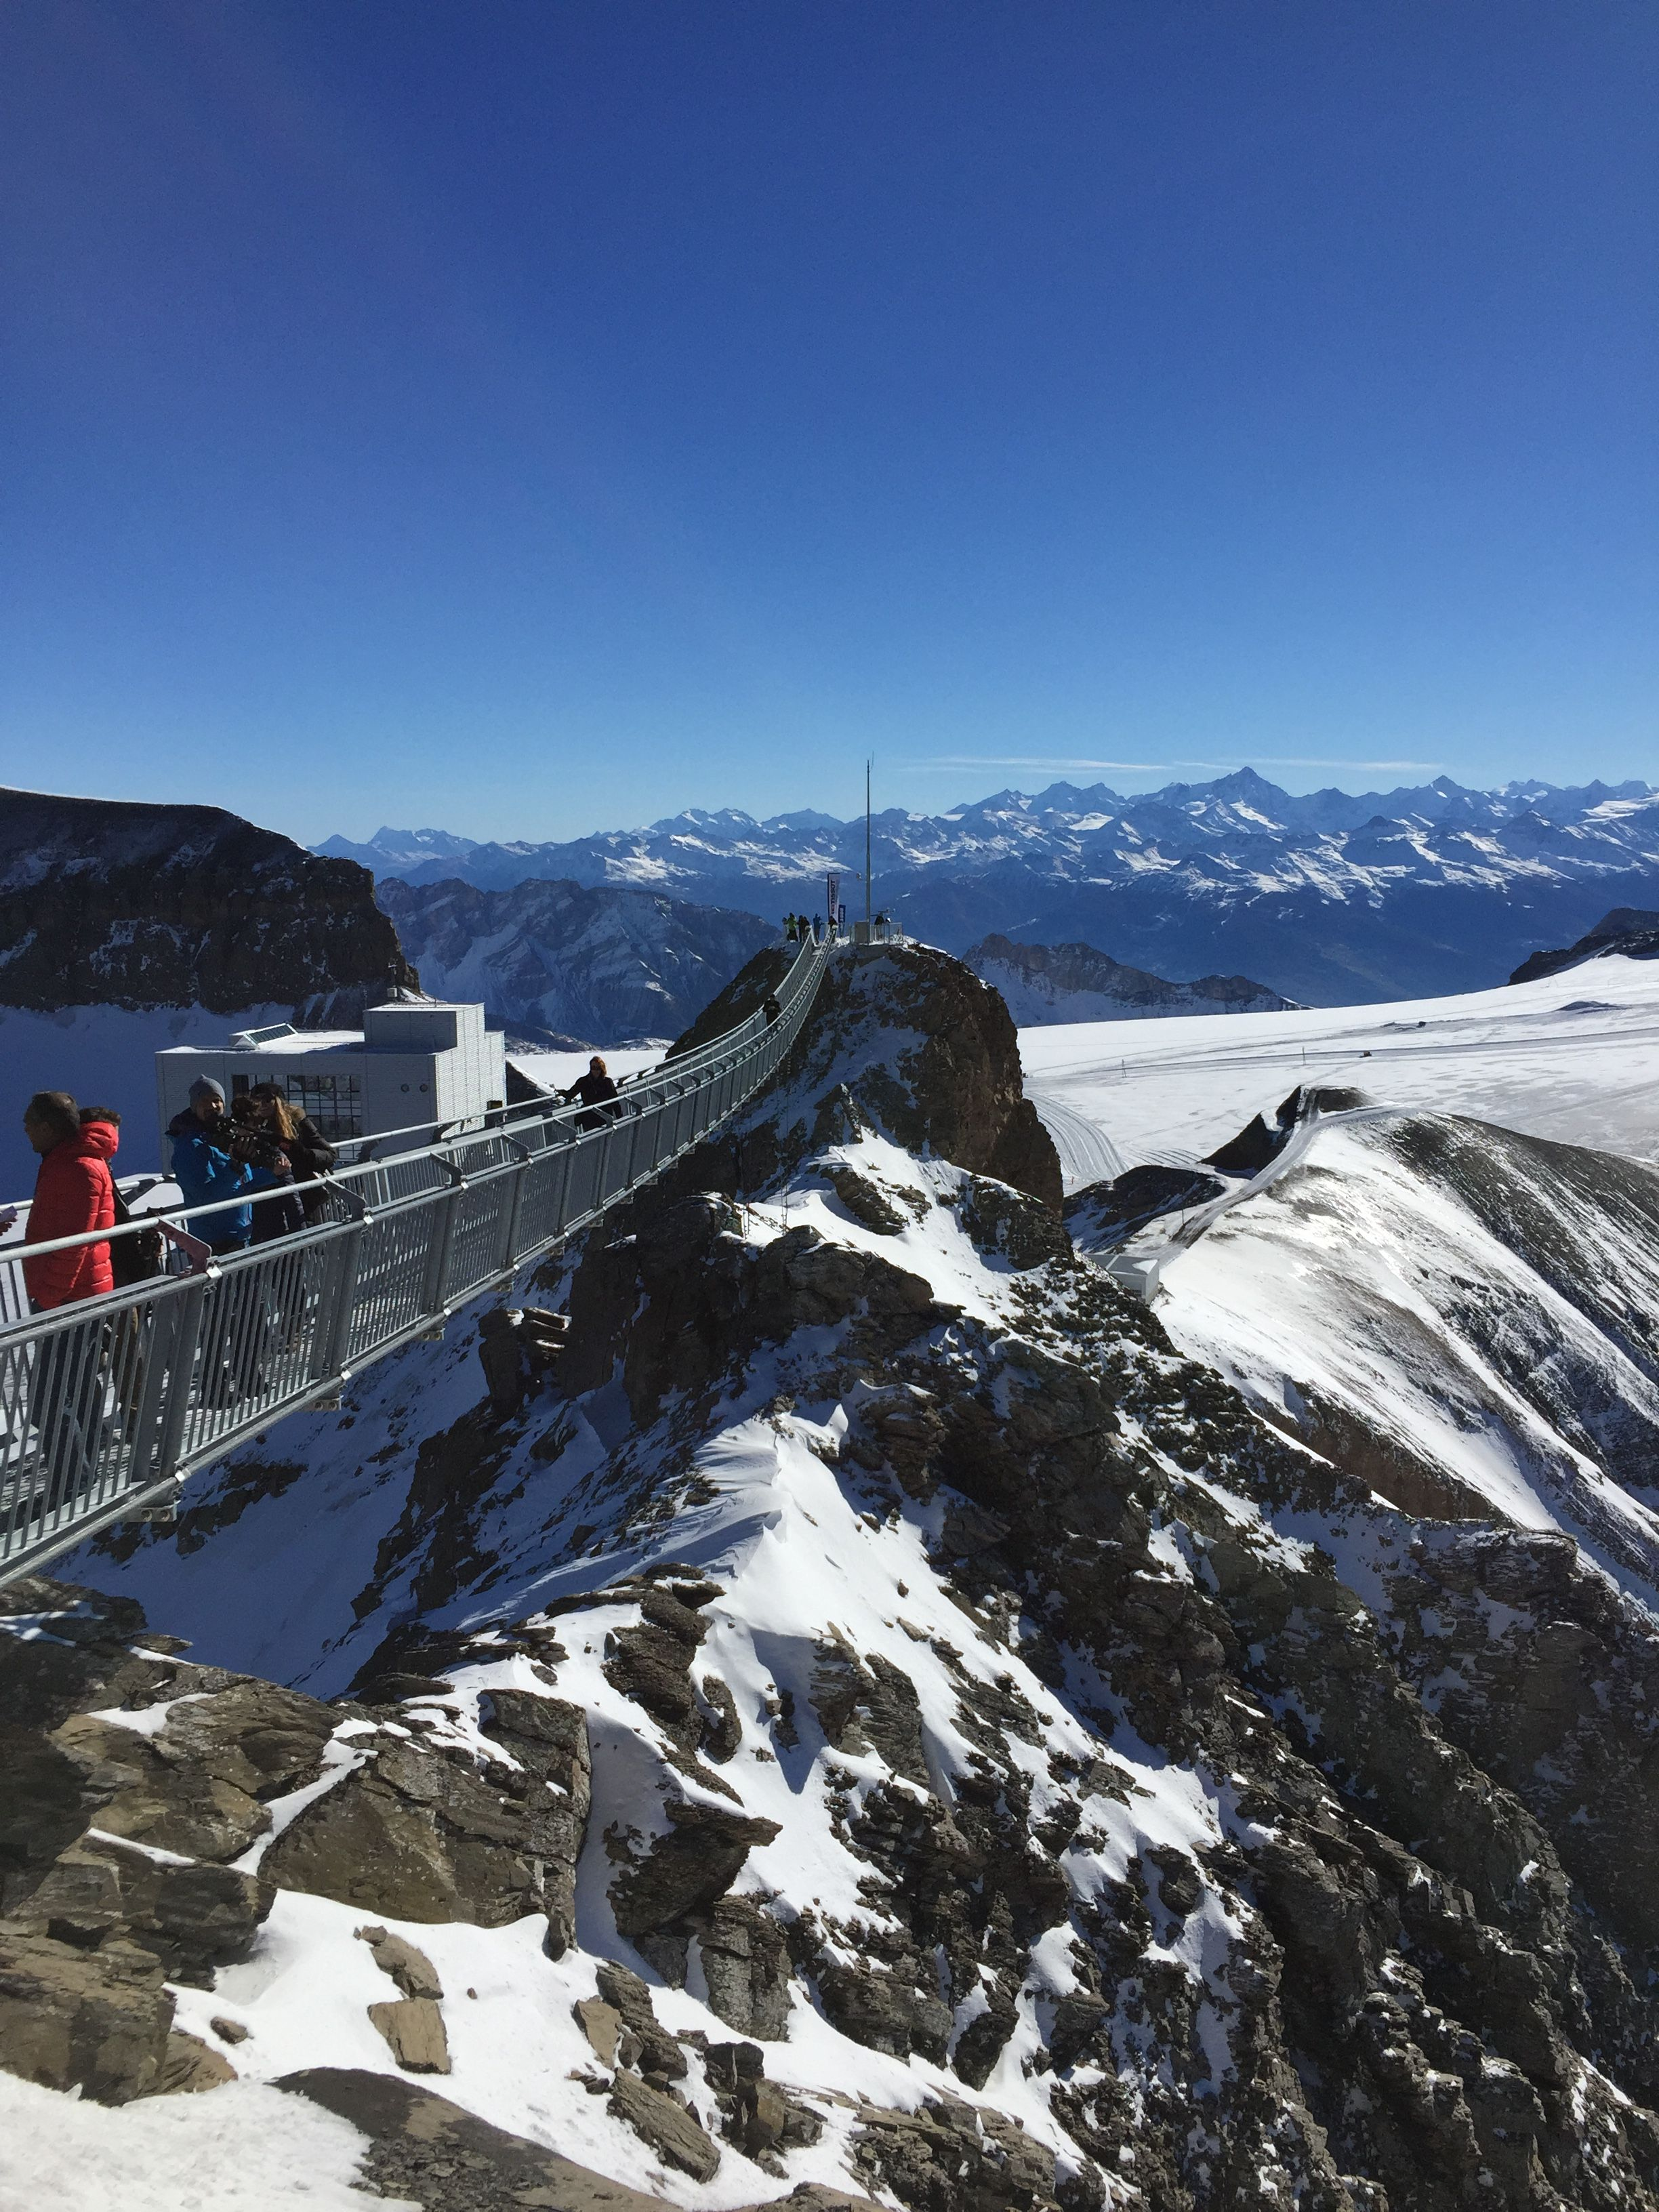 Httpswwwgooglerosearchq=Mario Botta Glacier 3000 Construction - Mountain Architecture Hut Chalet